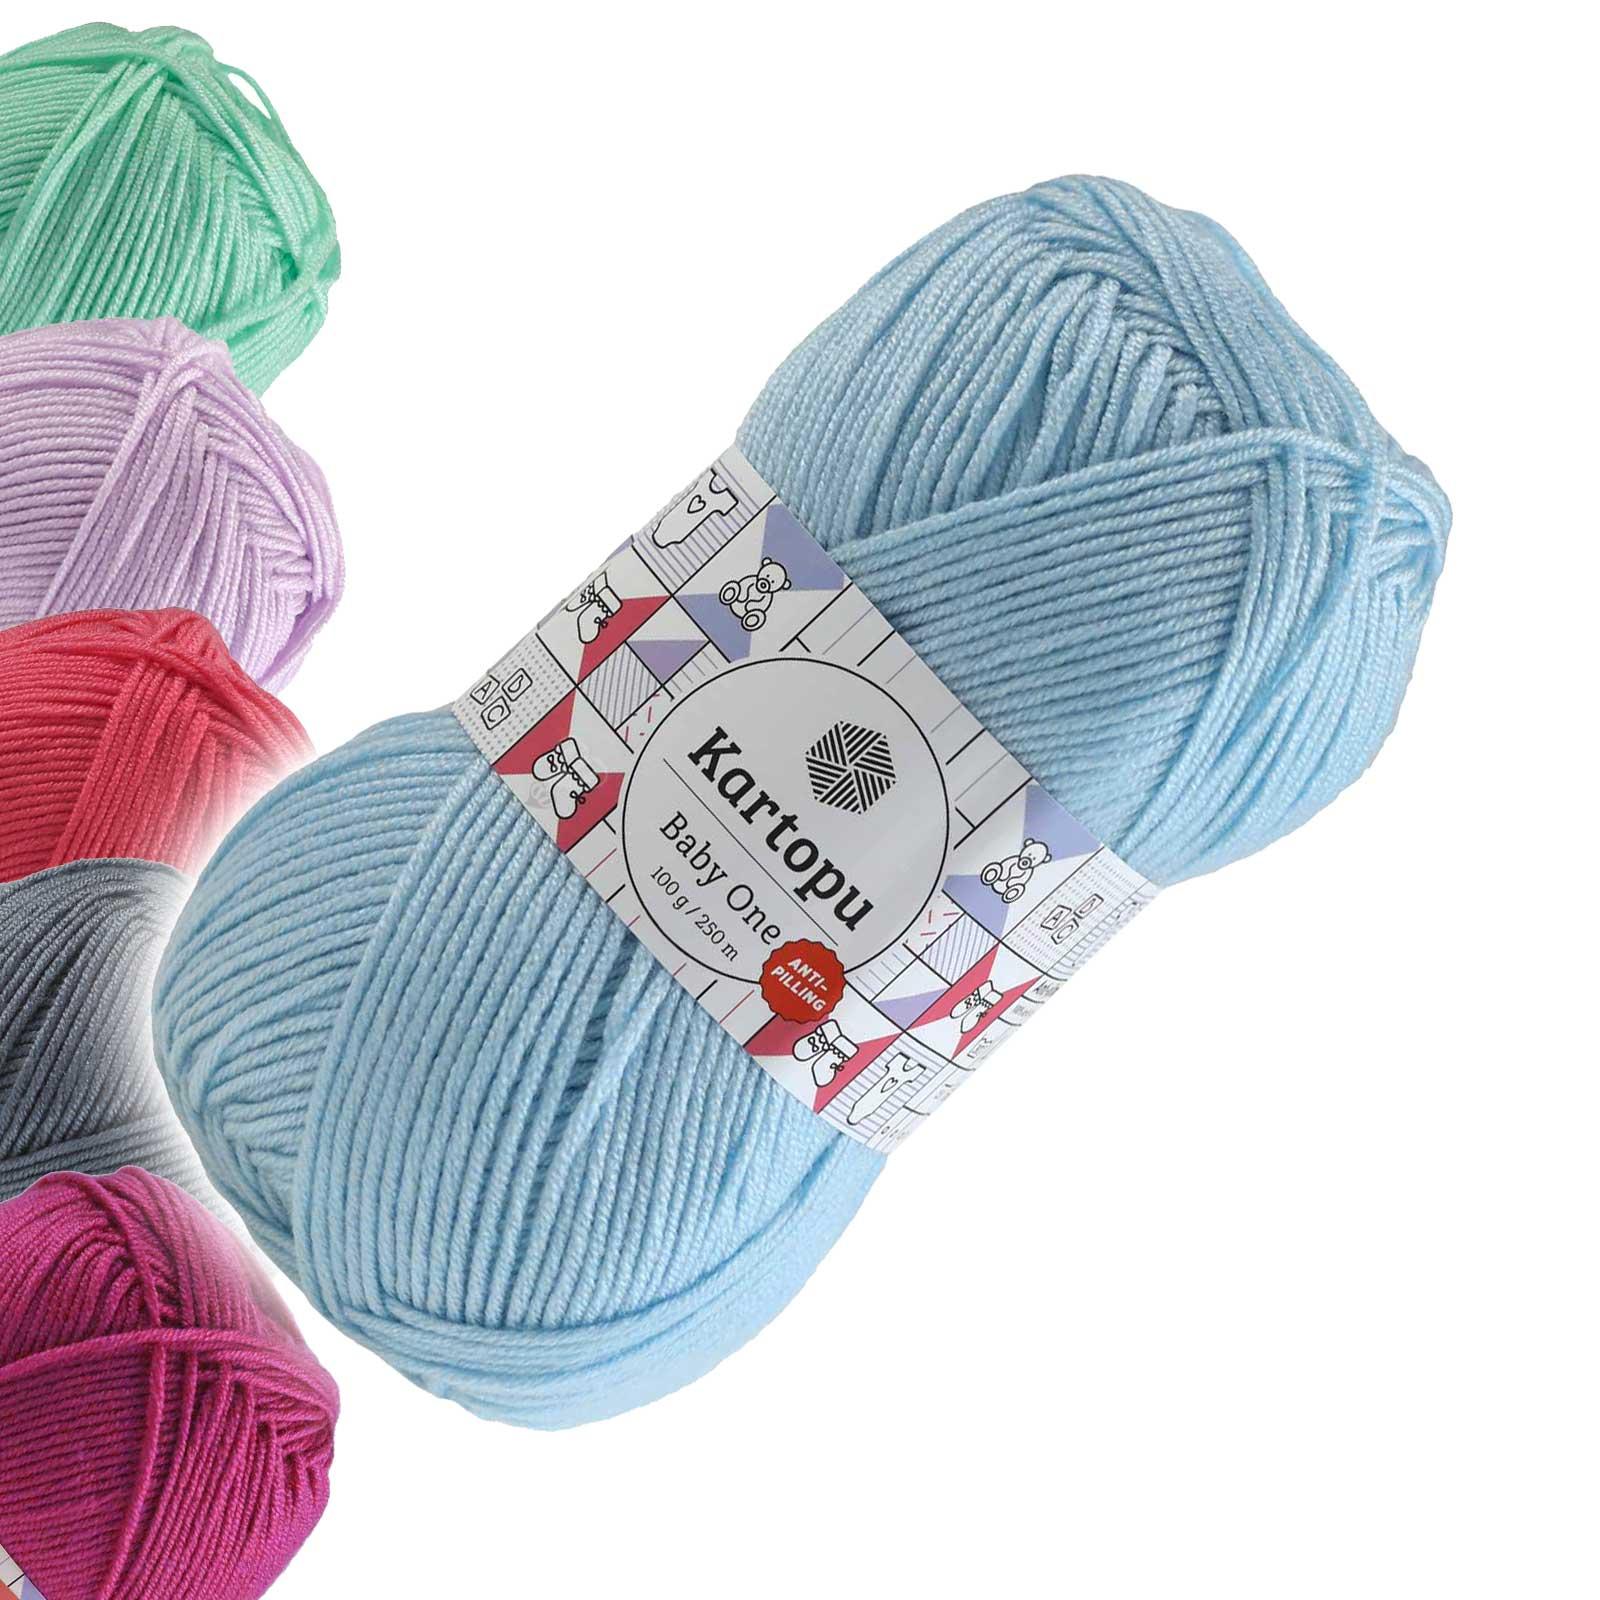 100g Strickgarn Kartopu BABY ONE Antipilling Babywolle Babystrickgarn, Farbwahl – Bild 22